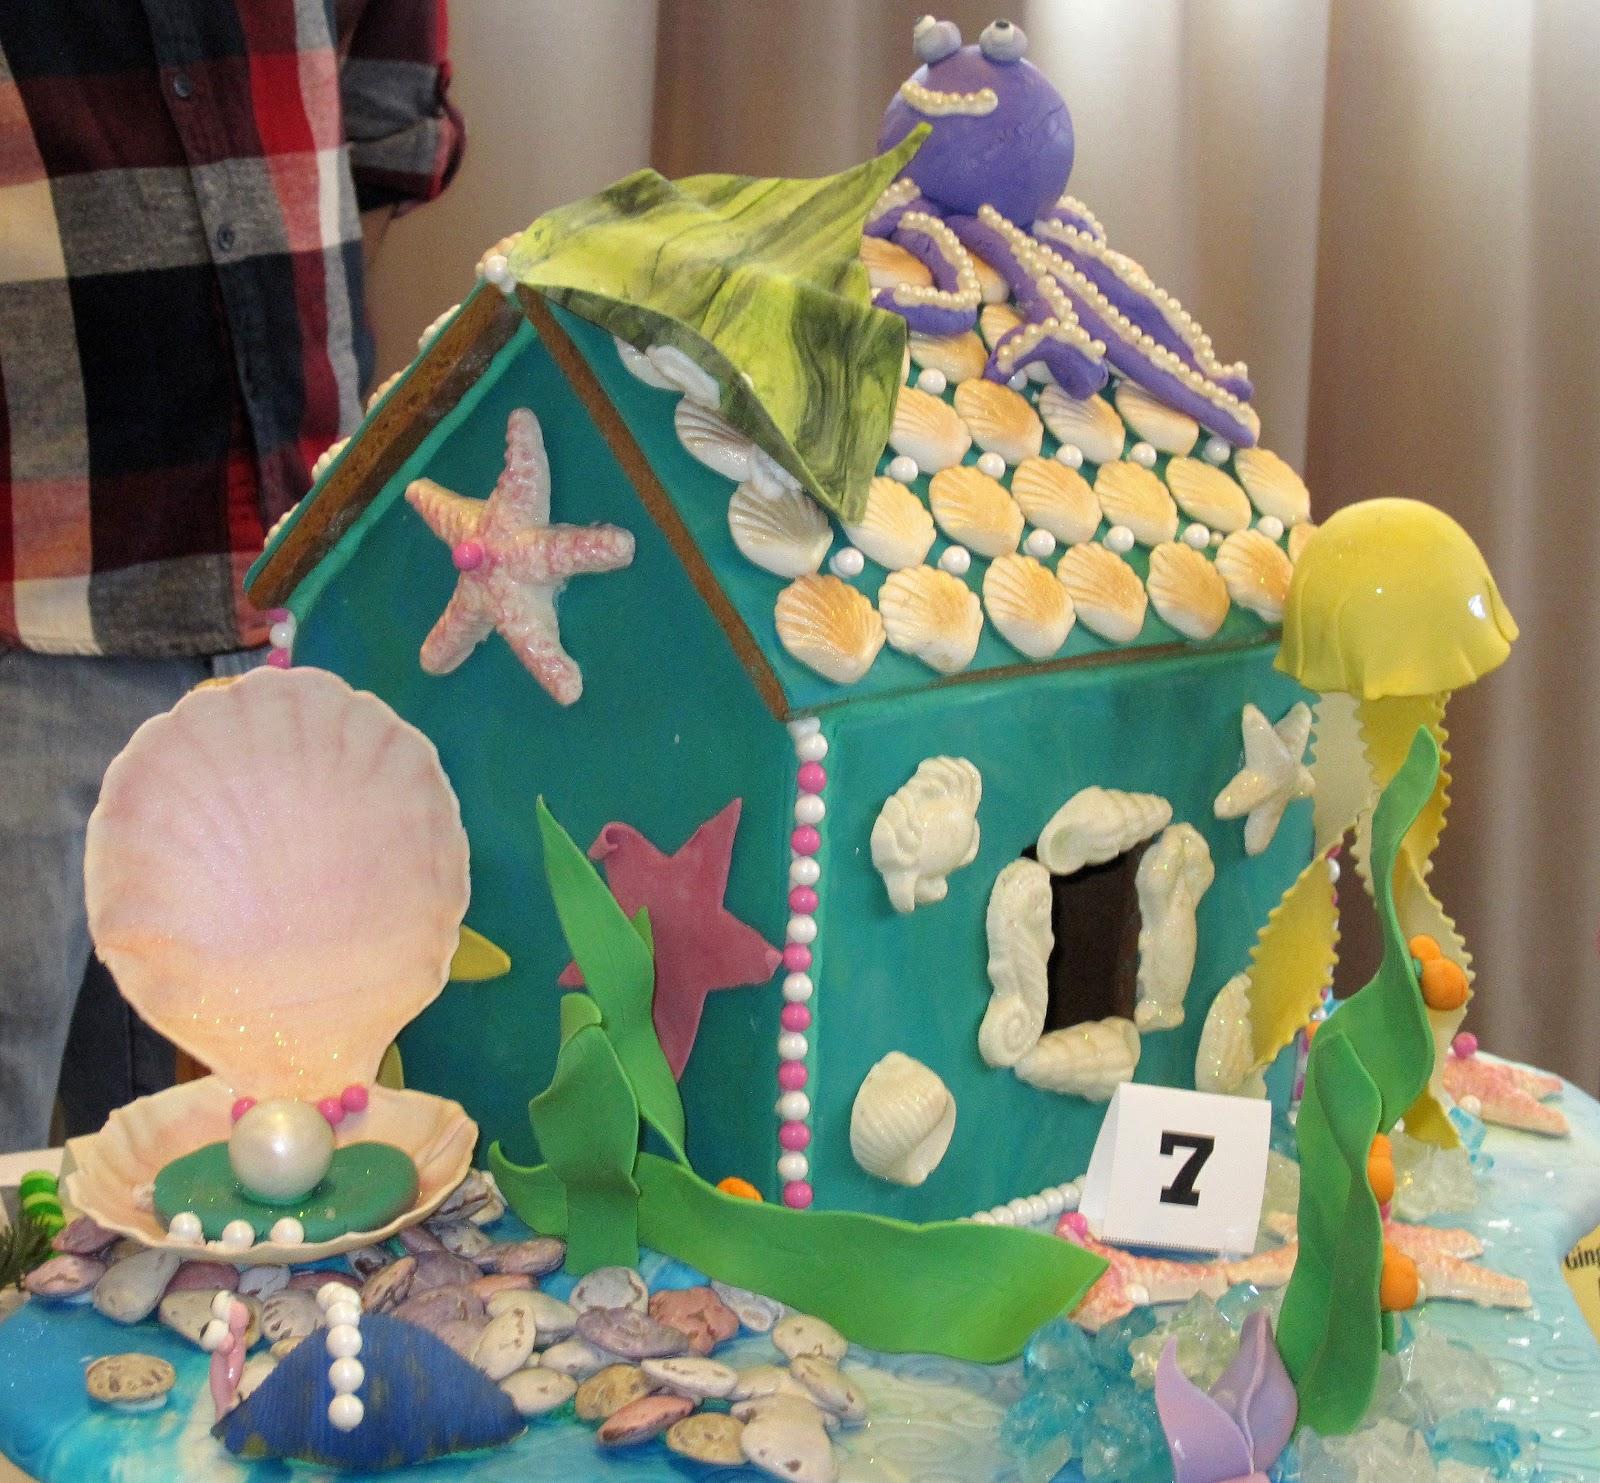 Amy Bradley Designs Gingerbread Houses: Amy Bradley Designs: December 2012